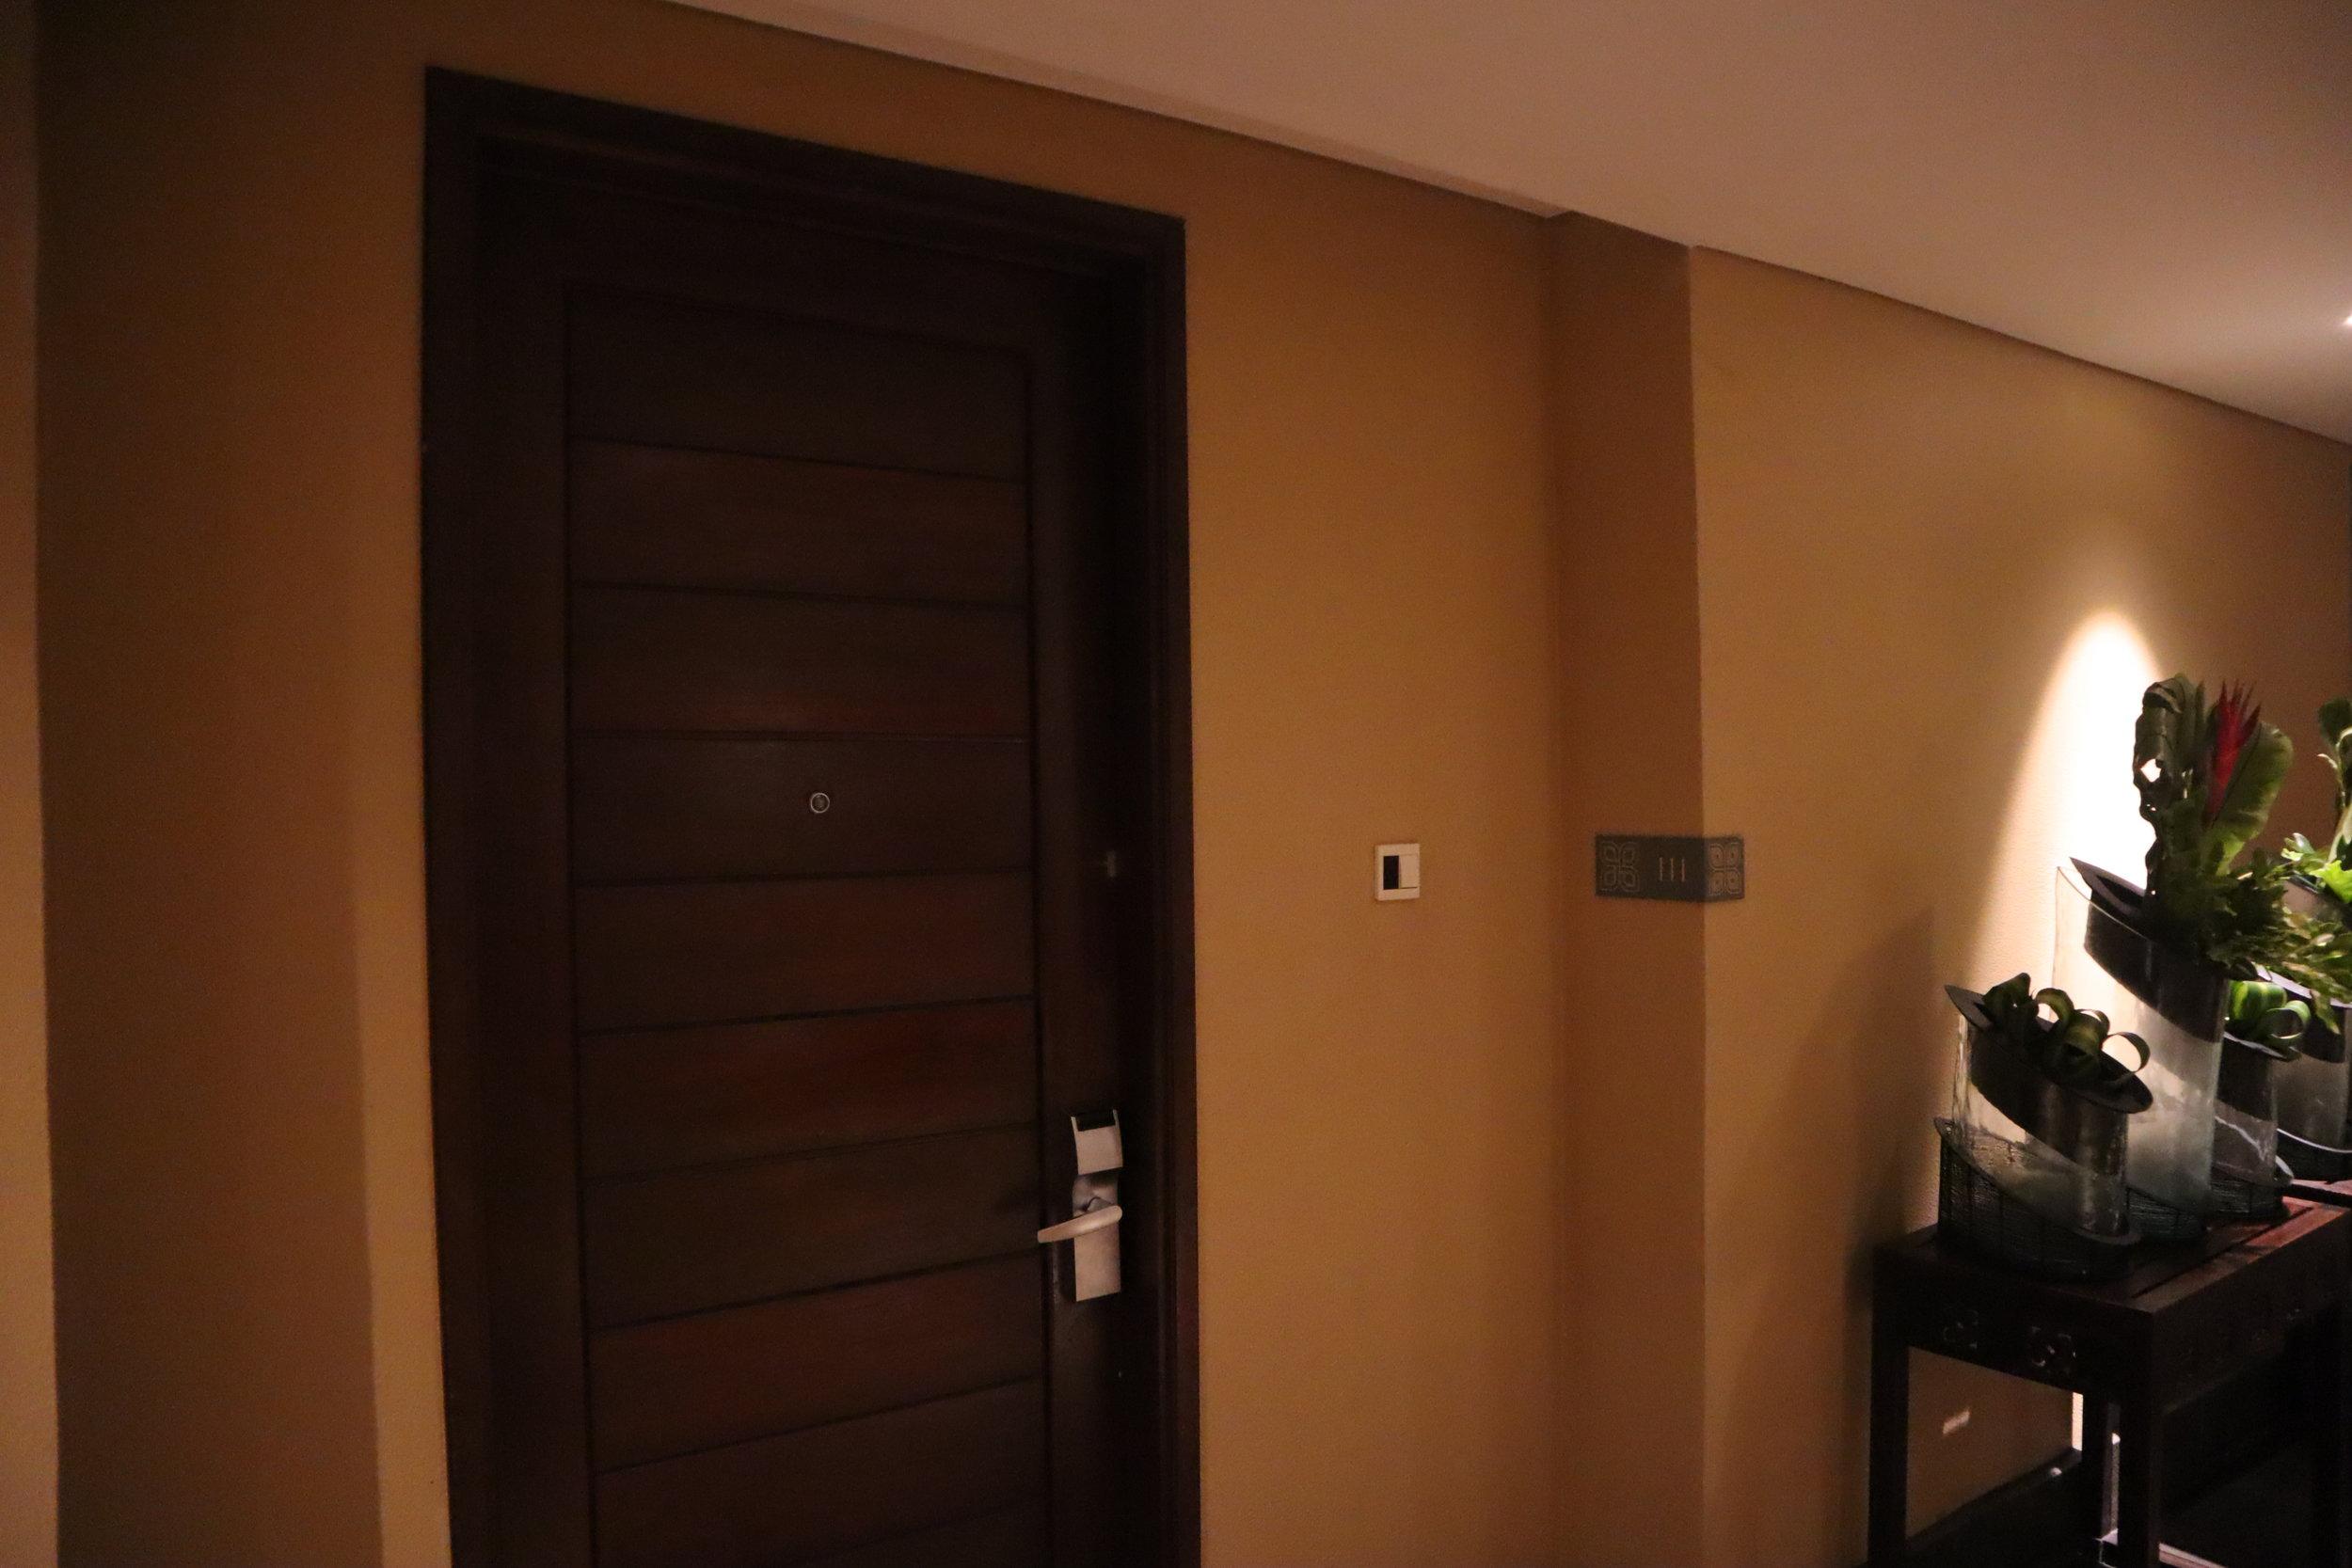 St. Regis Bali – Room 111